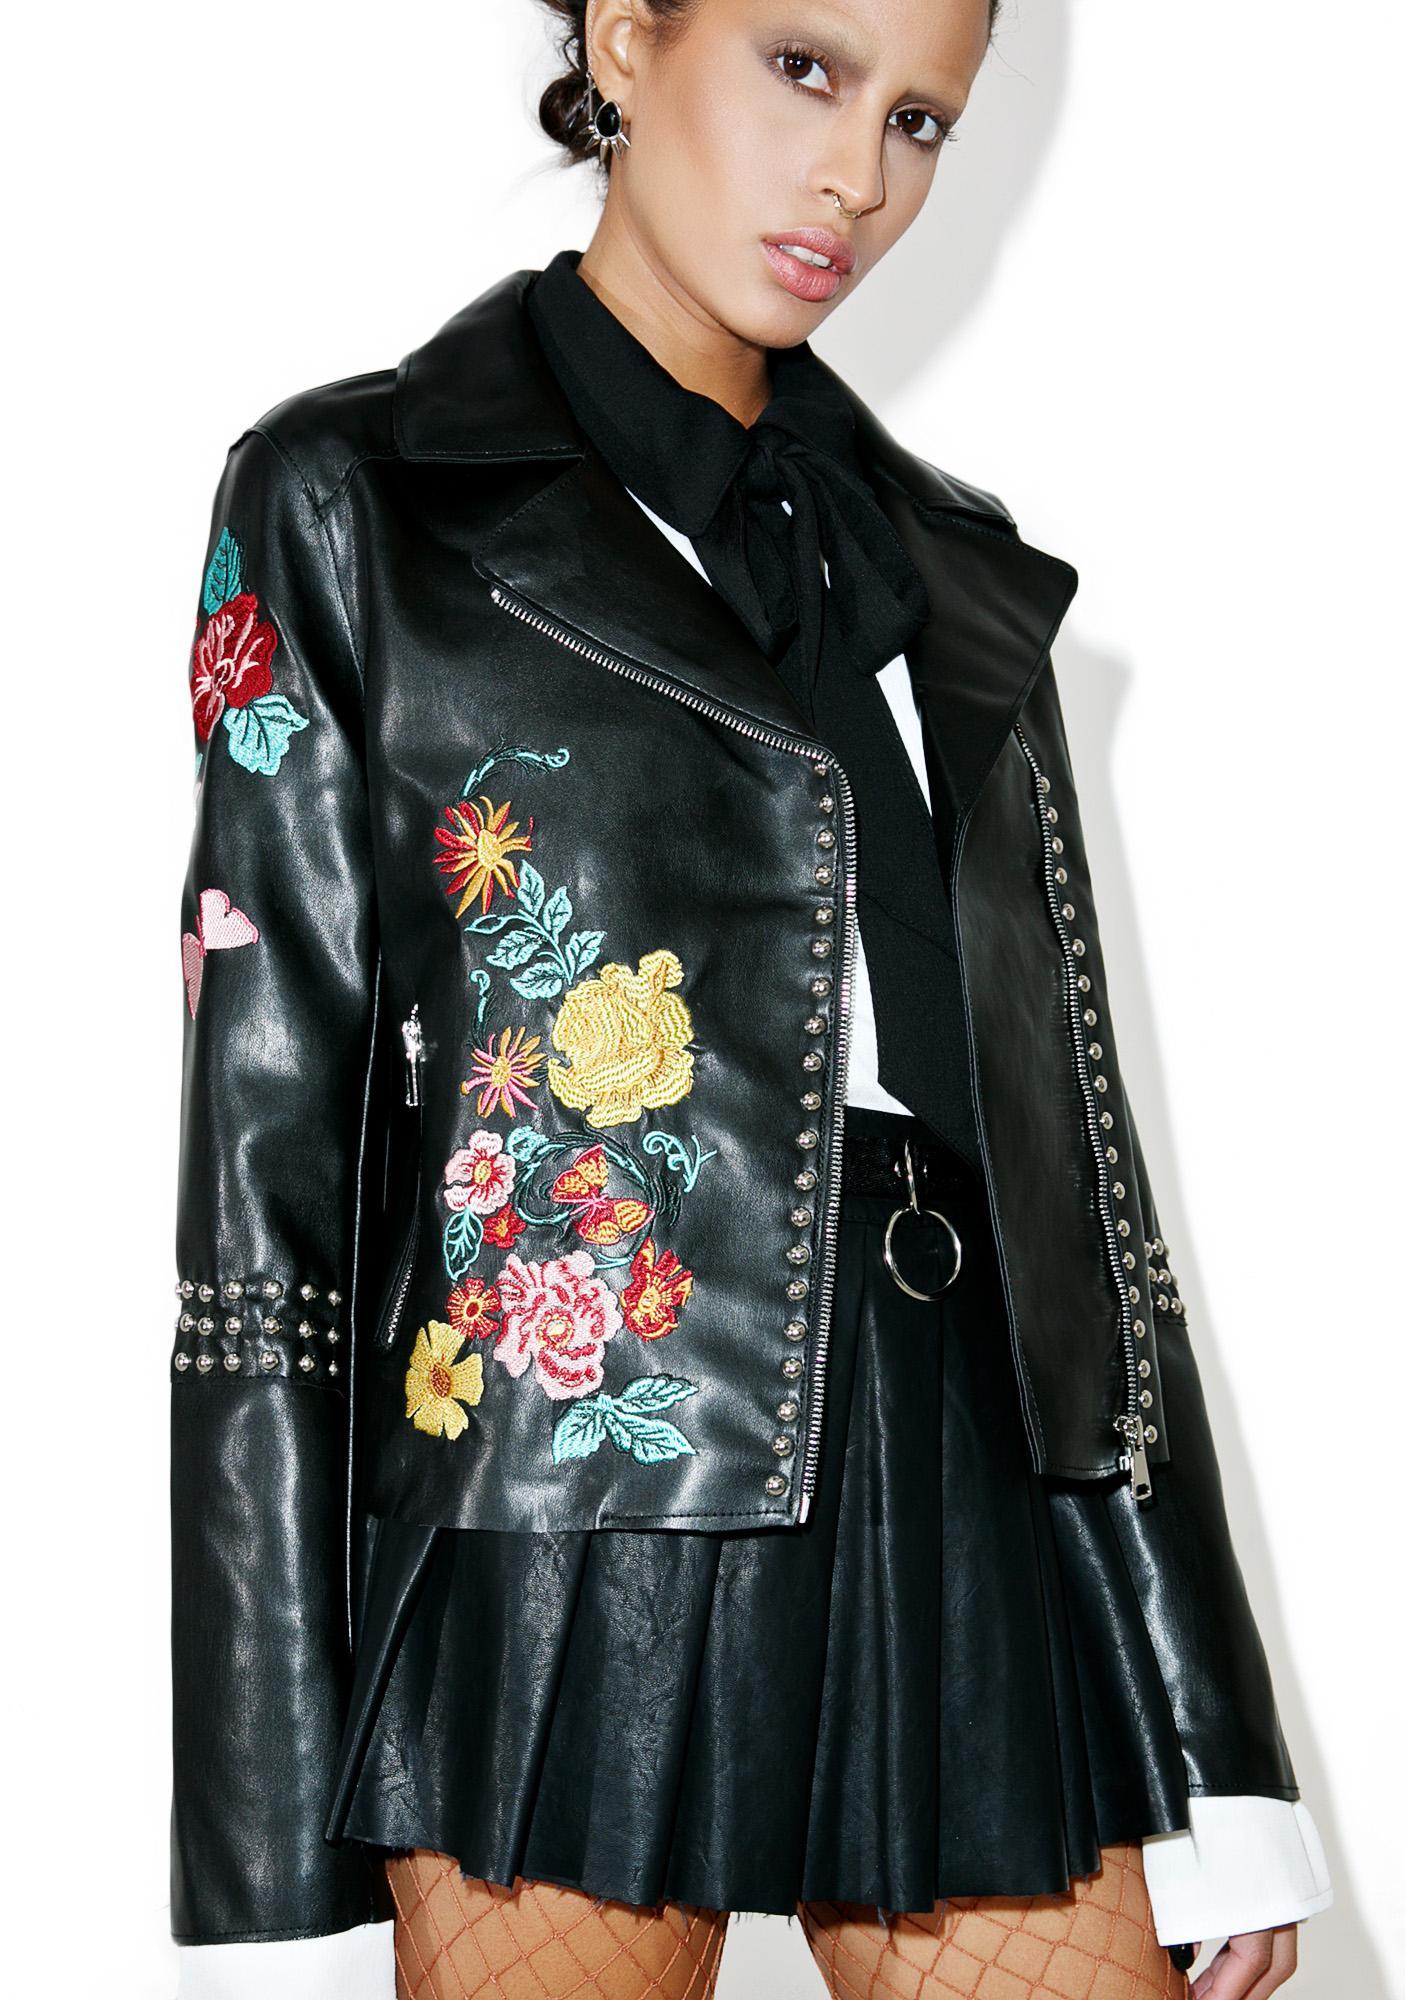 Glamorous Halcyon Embroidered Moto Jacket